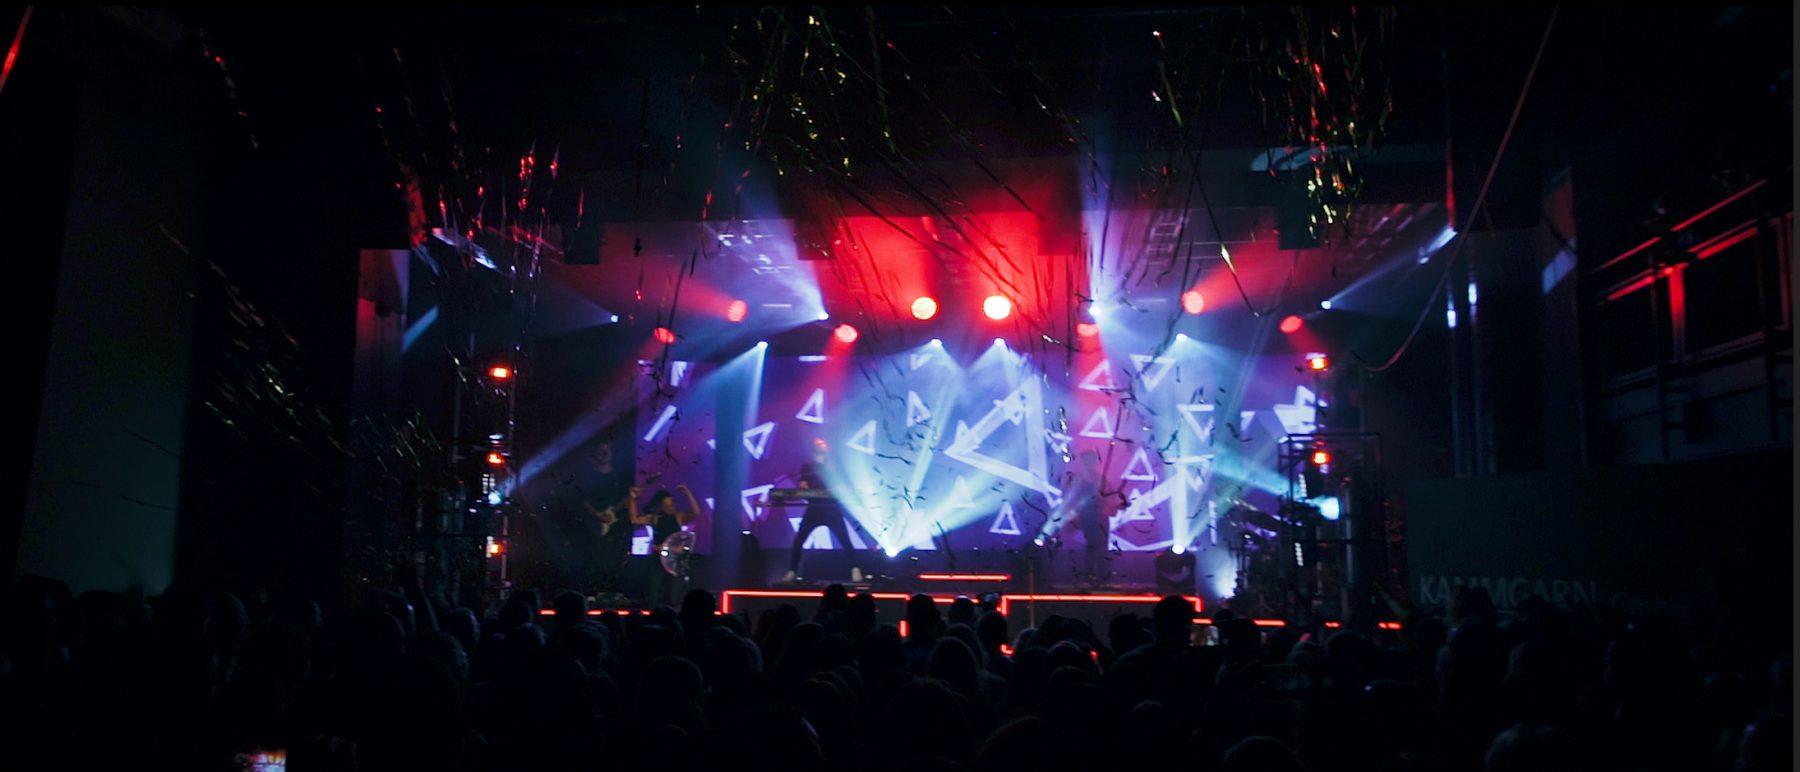 Glasperlenspiels live show